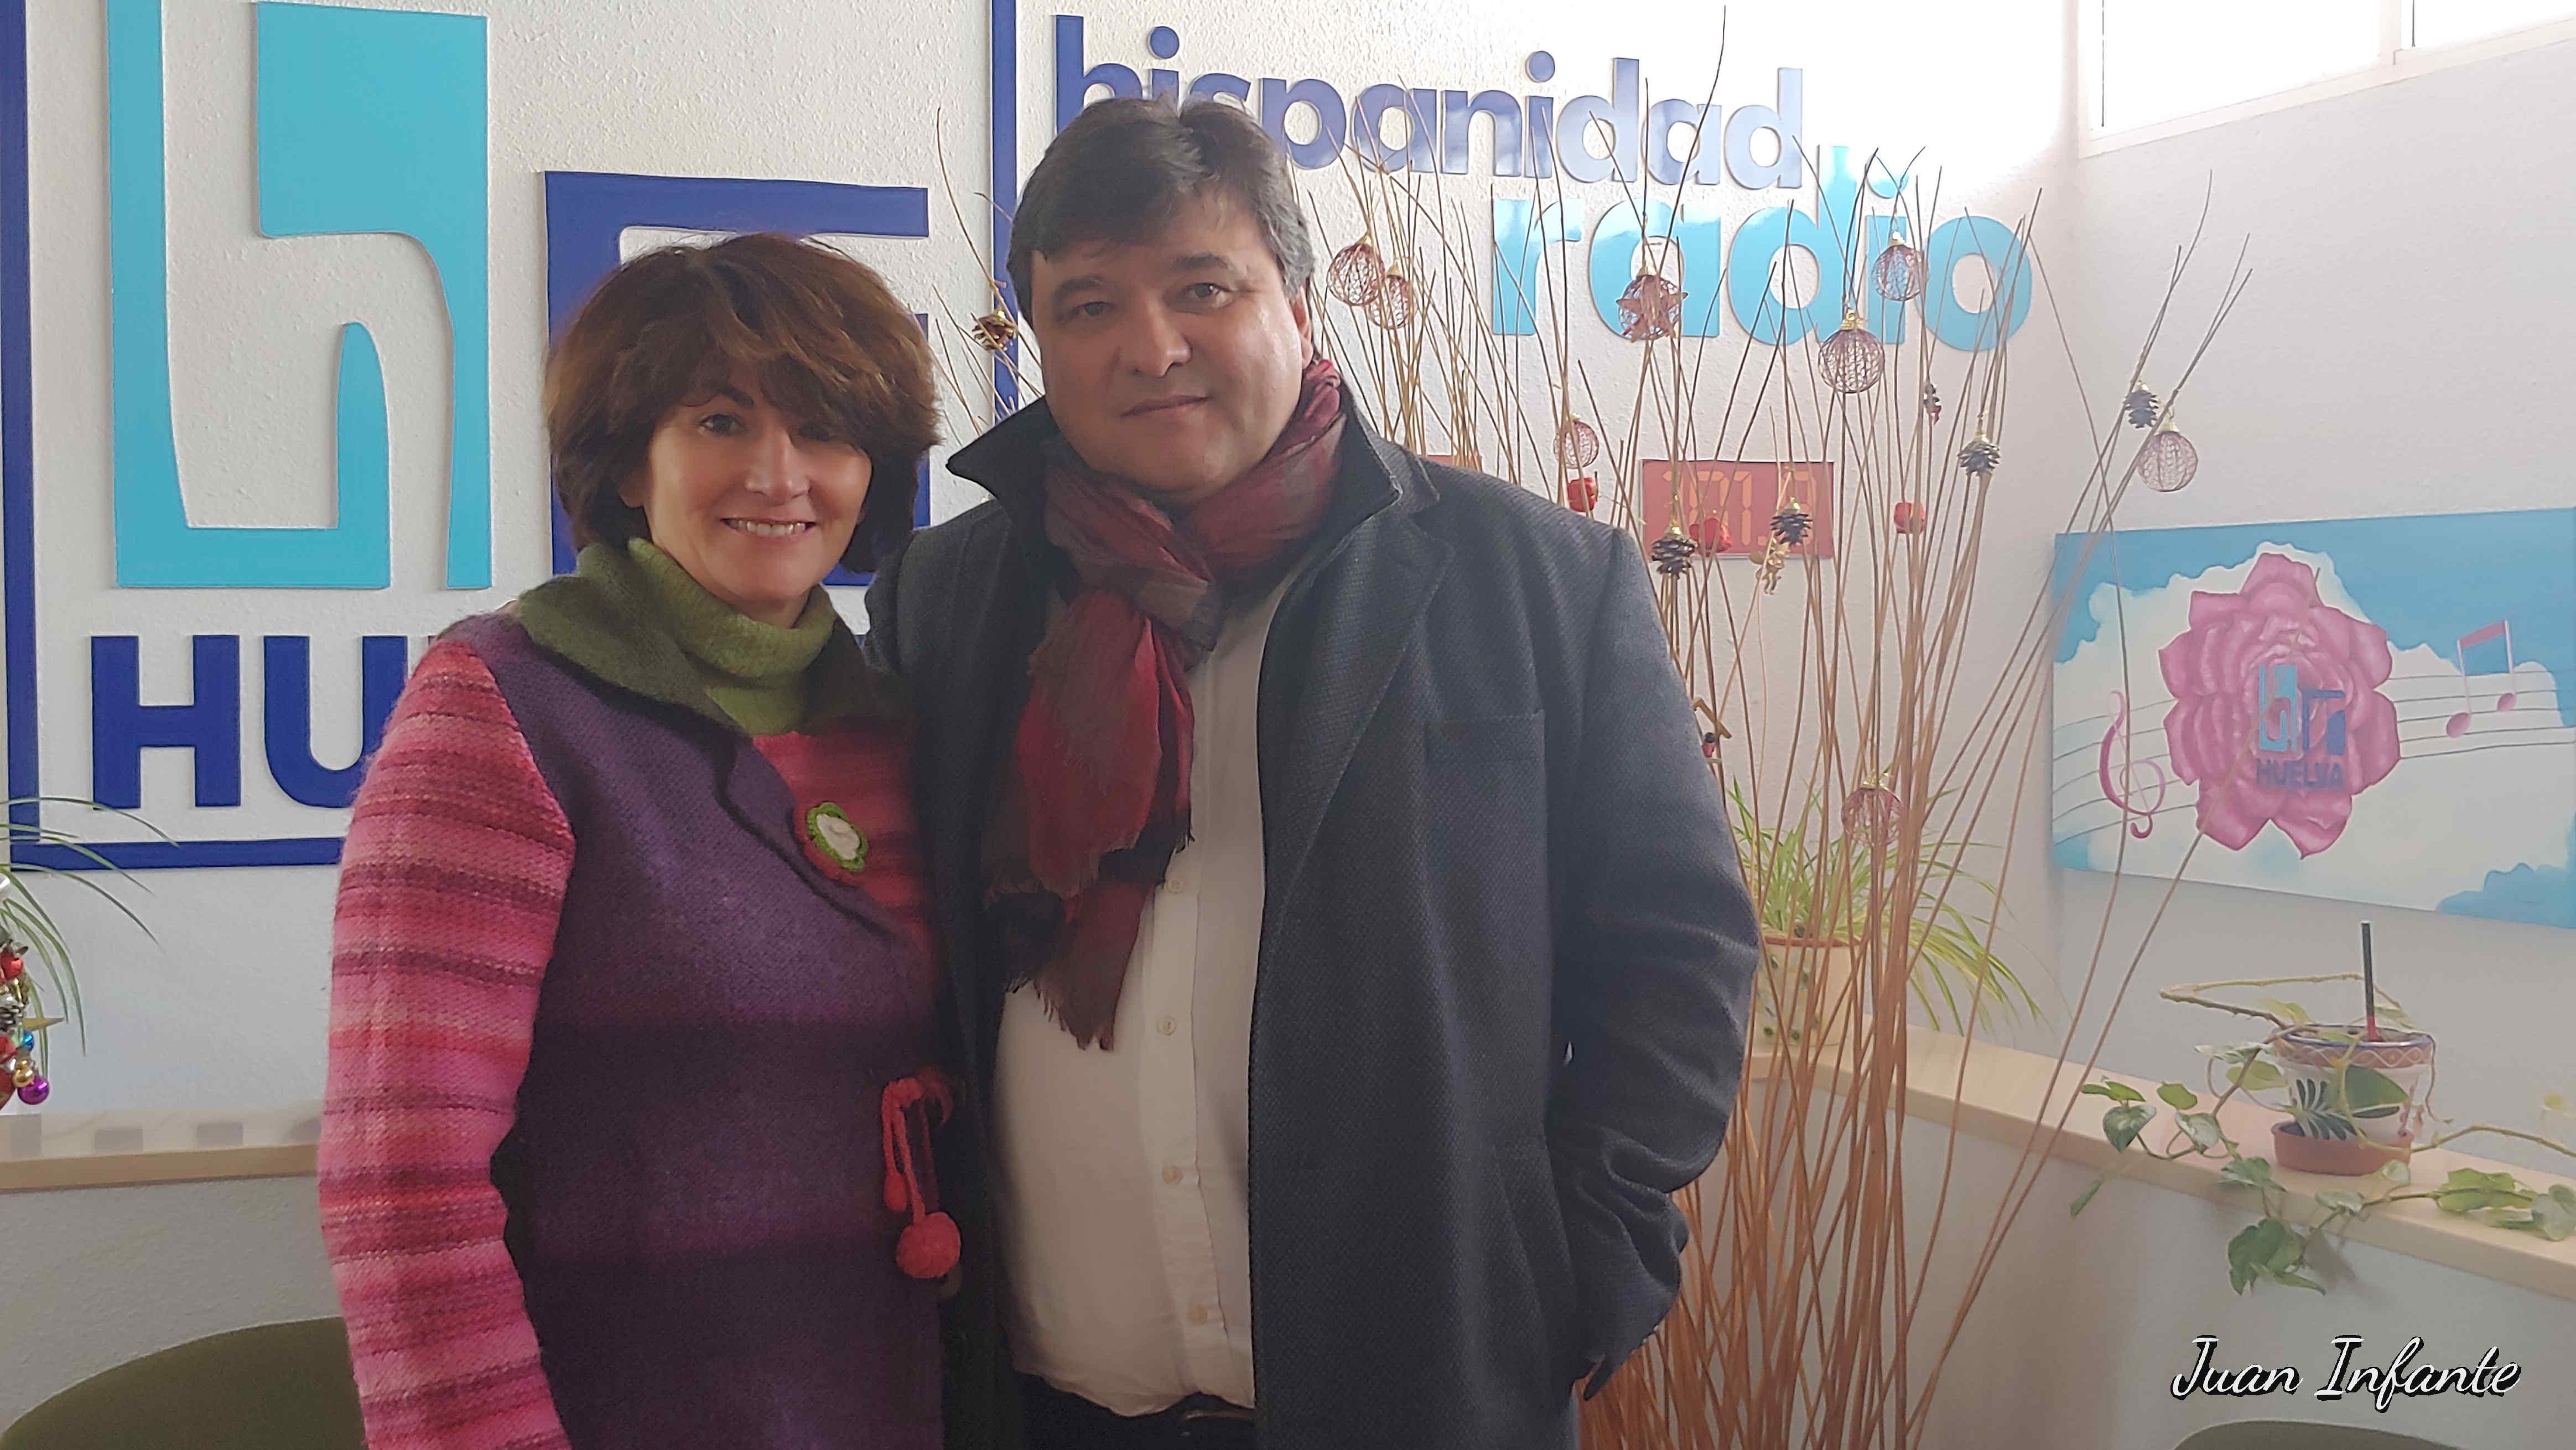 Queremos Saber 26-12-2018 Alcalde de Huelva Gabriel Cruz